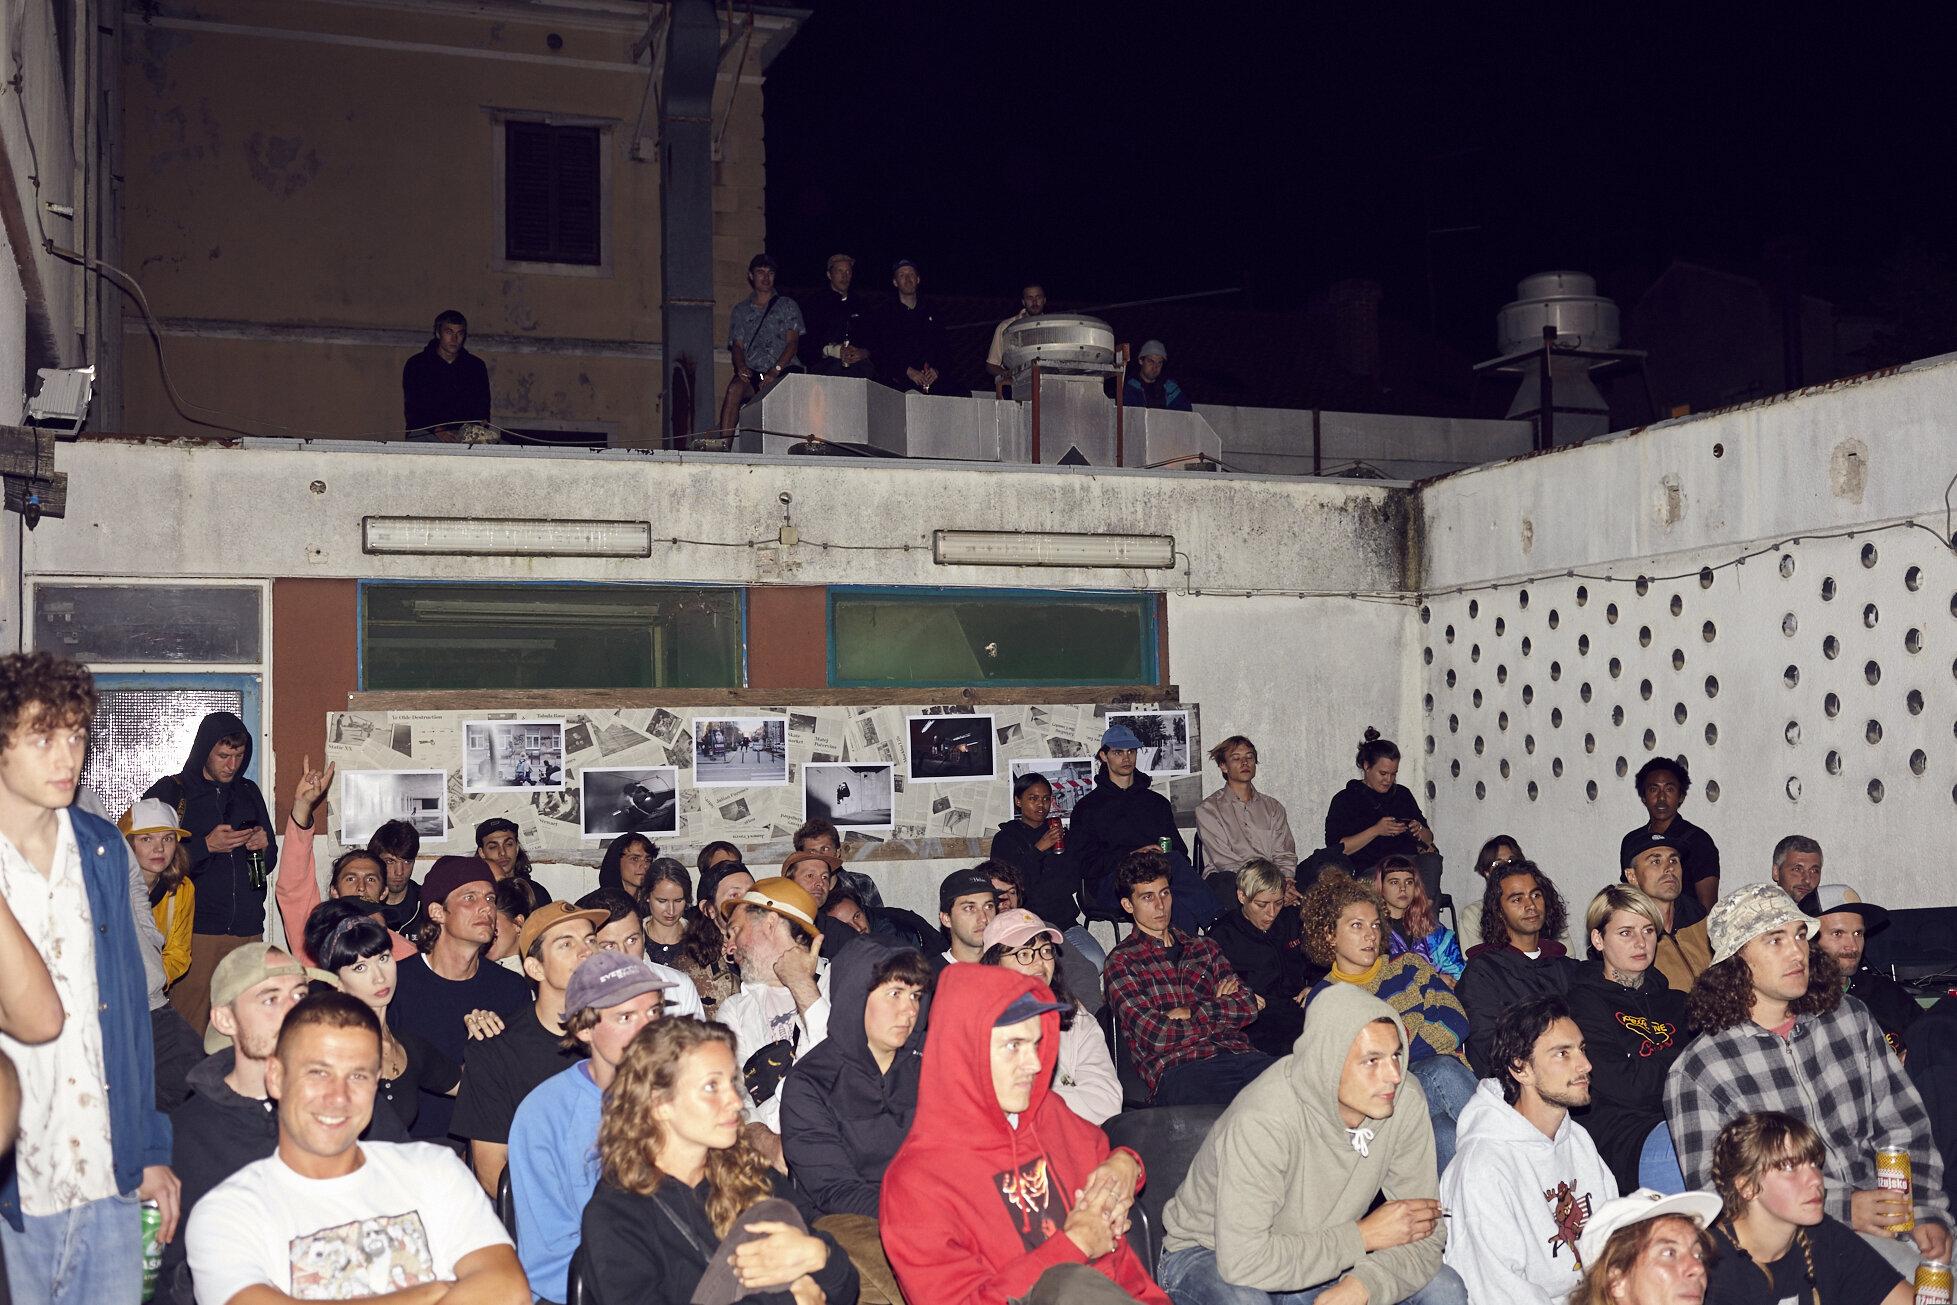 09262019_fazana_vladimir film festival_croatia_Capture_0034.jpg